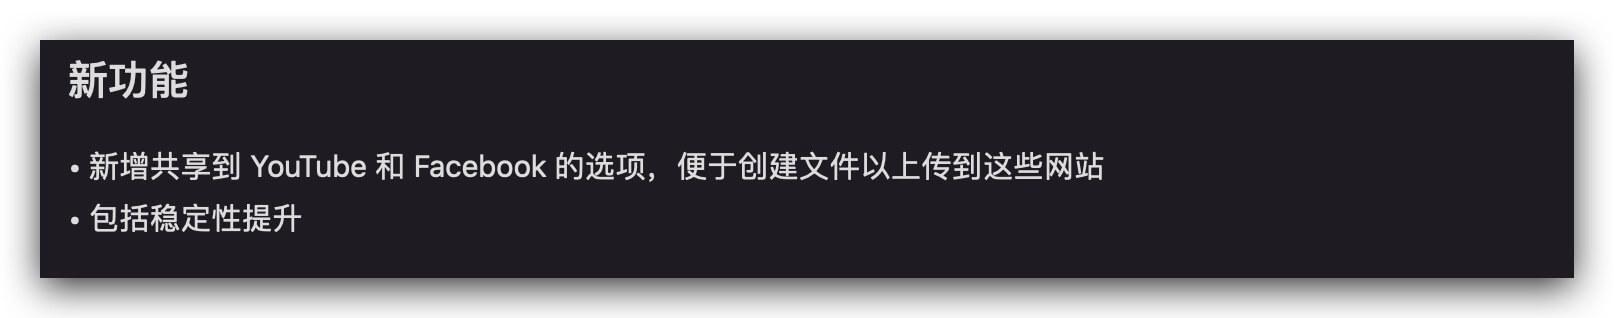 Apple Compressor 4.5.1 破解版免费下载 中英文版 苹果视频压缩编码转码